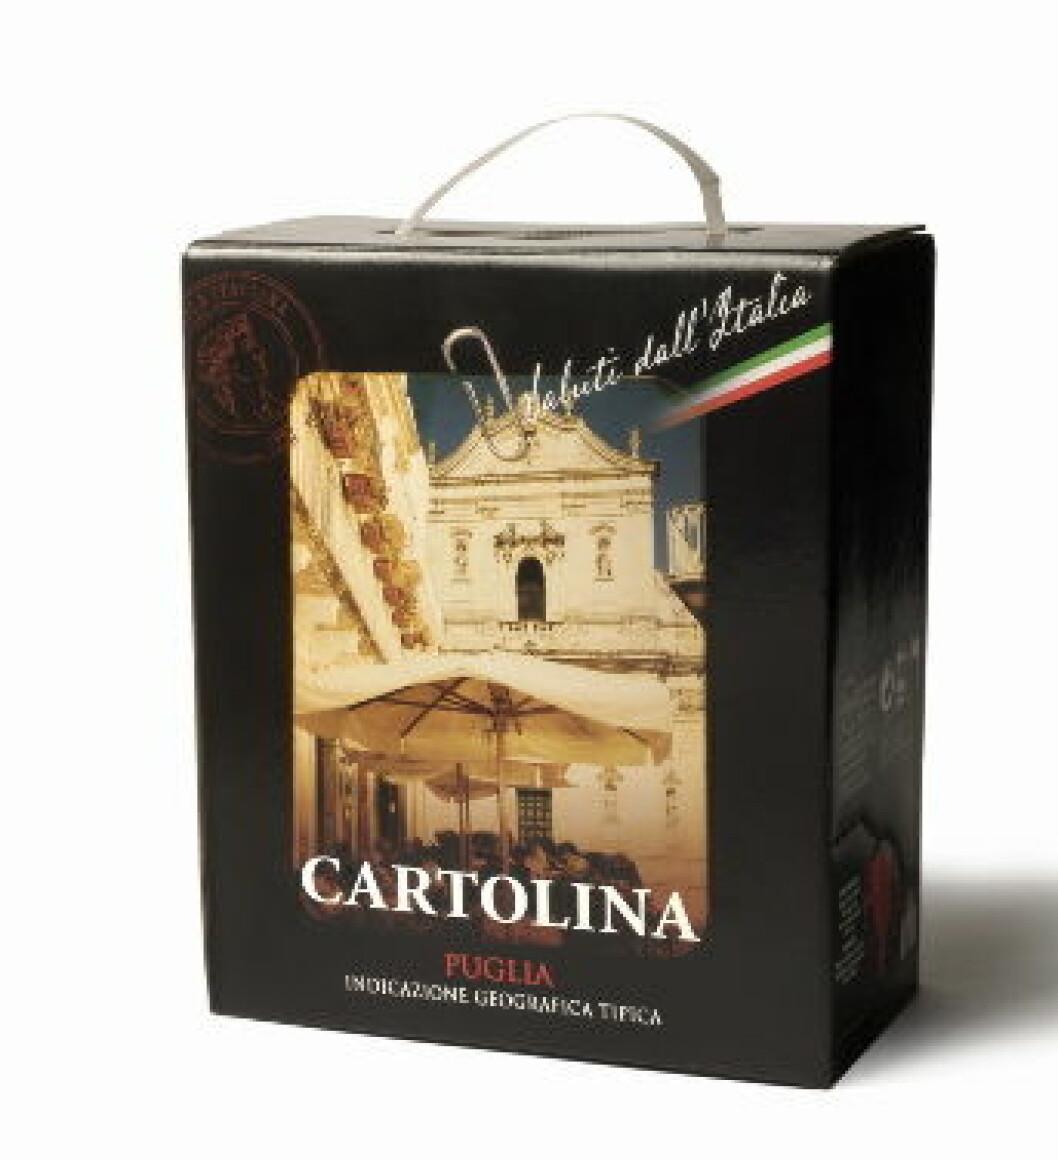 Cartolina Puglia BIB nett